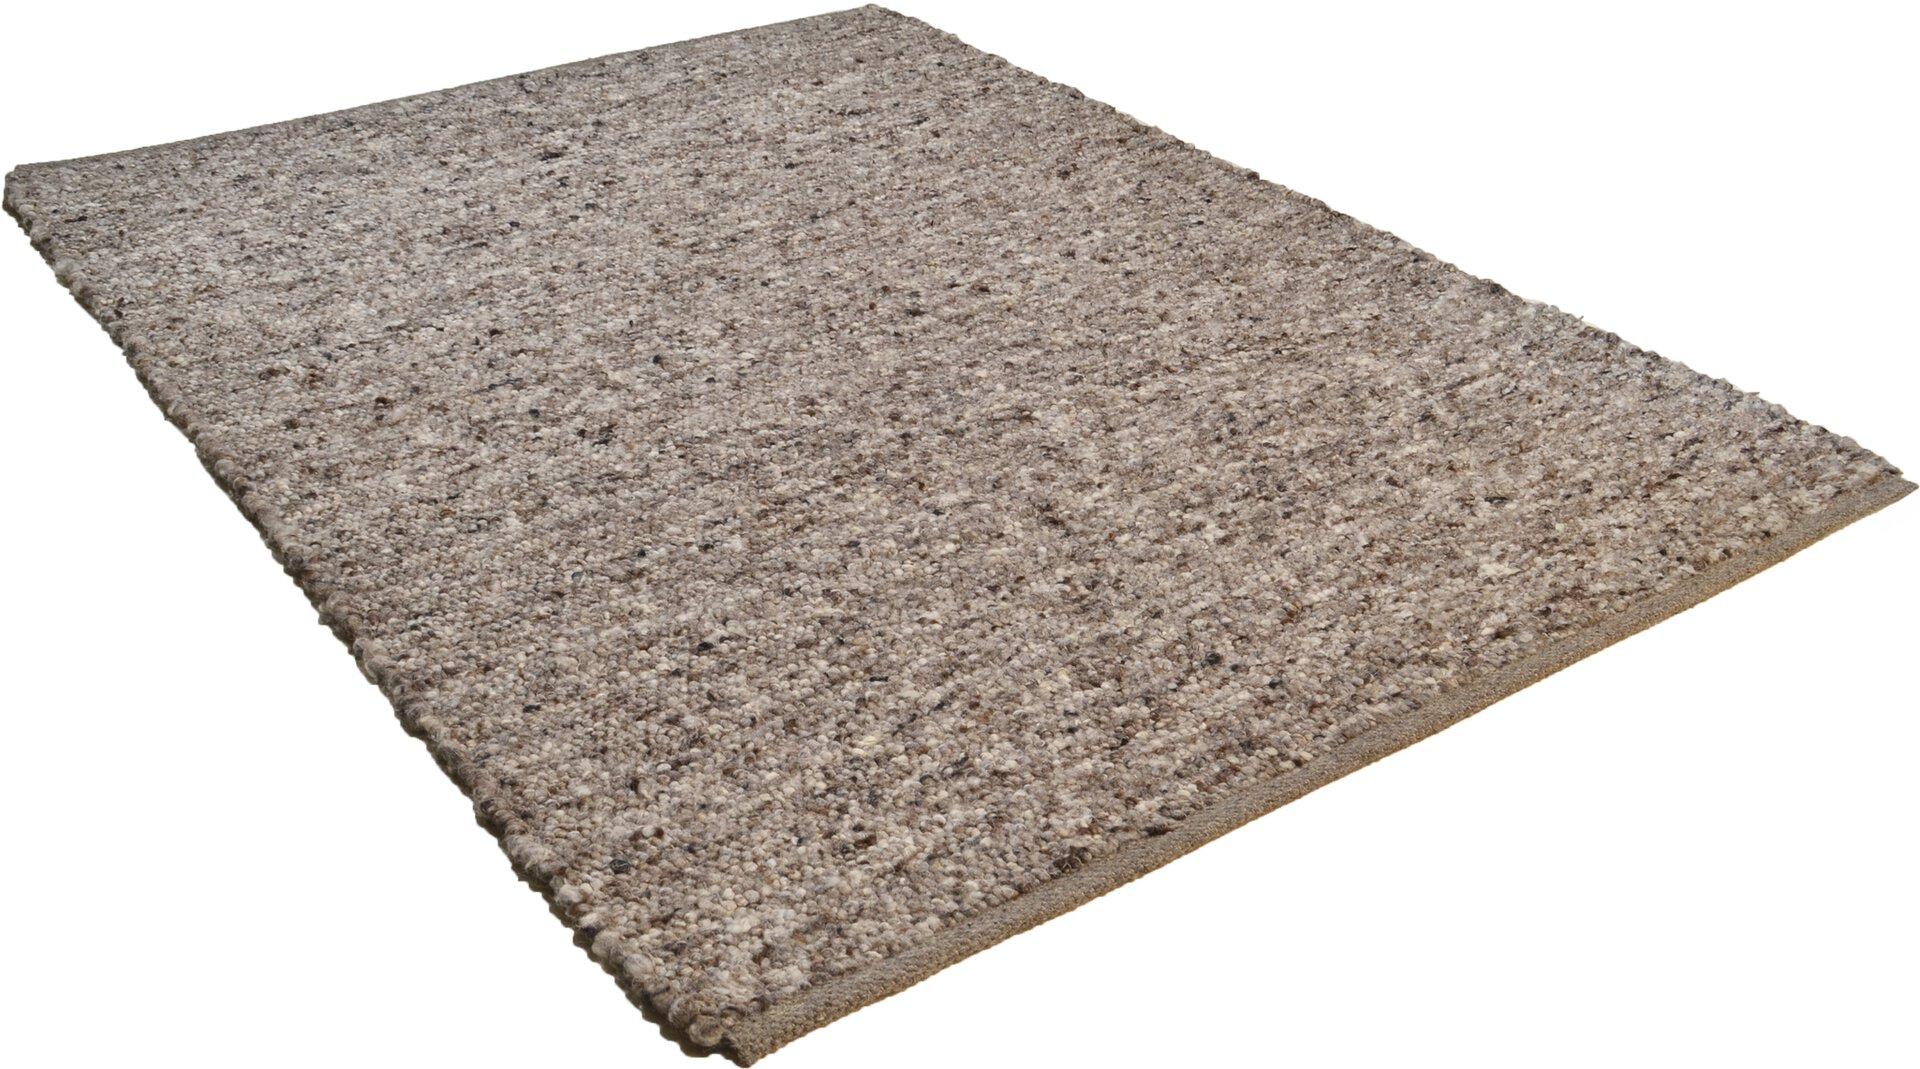 Handwebteppich Woll-Lust Theko Textil grau 1 x 2 cm